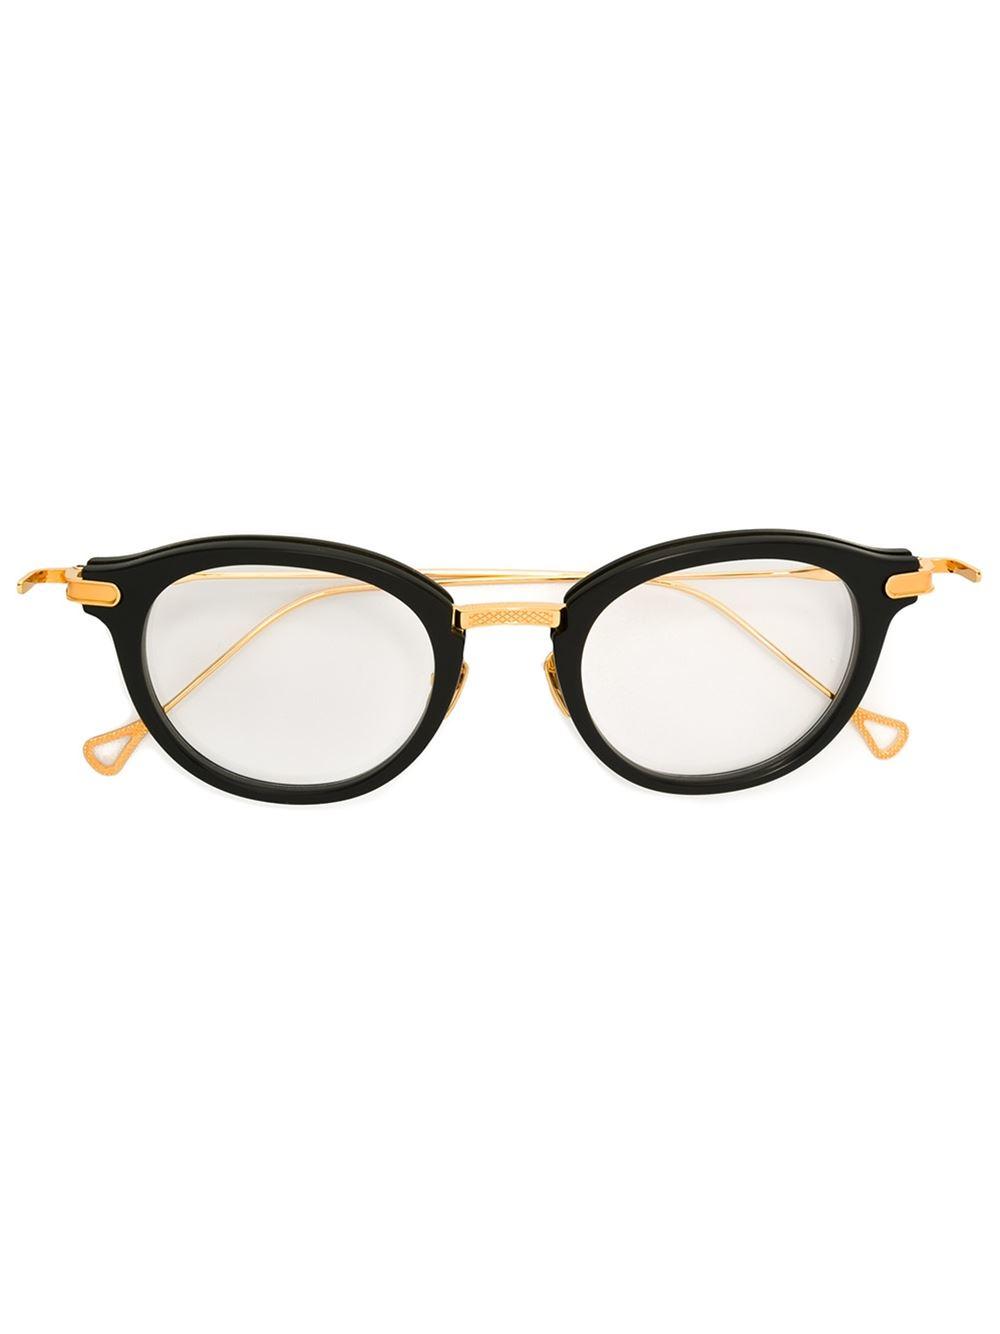 1a532eb82f4 Dita Eyeglasses Frames